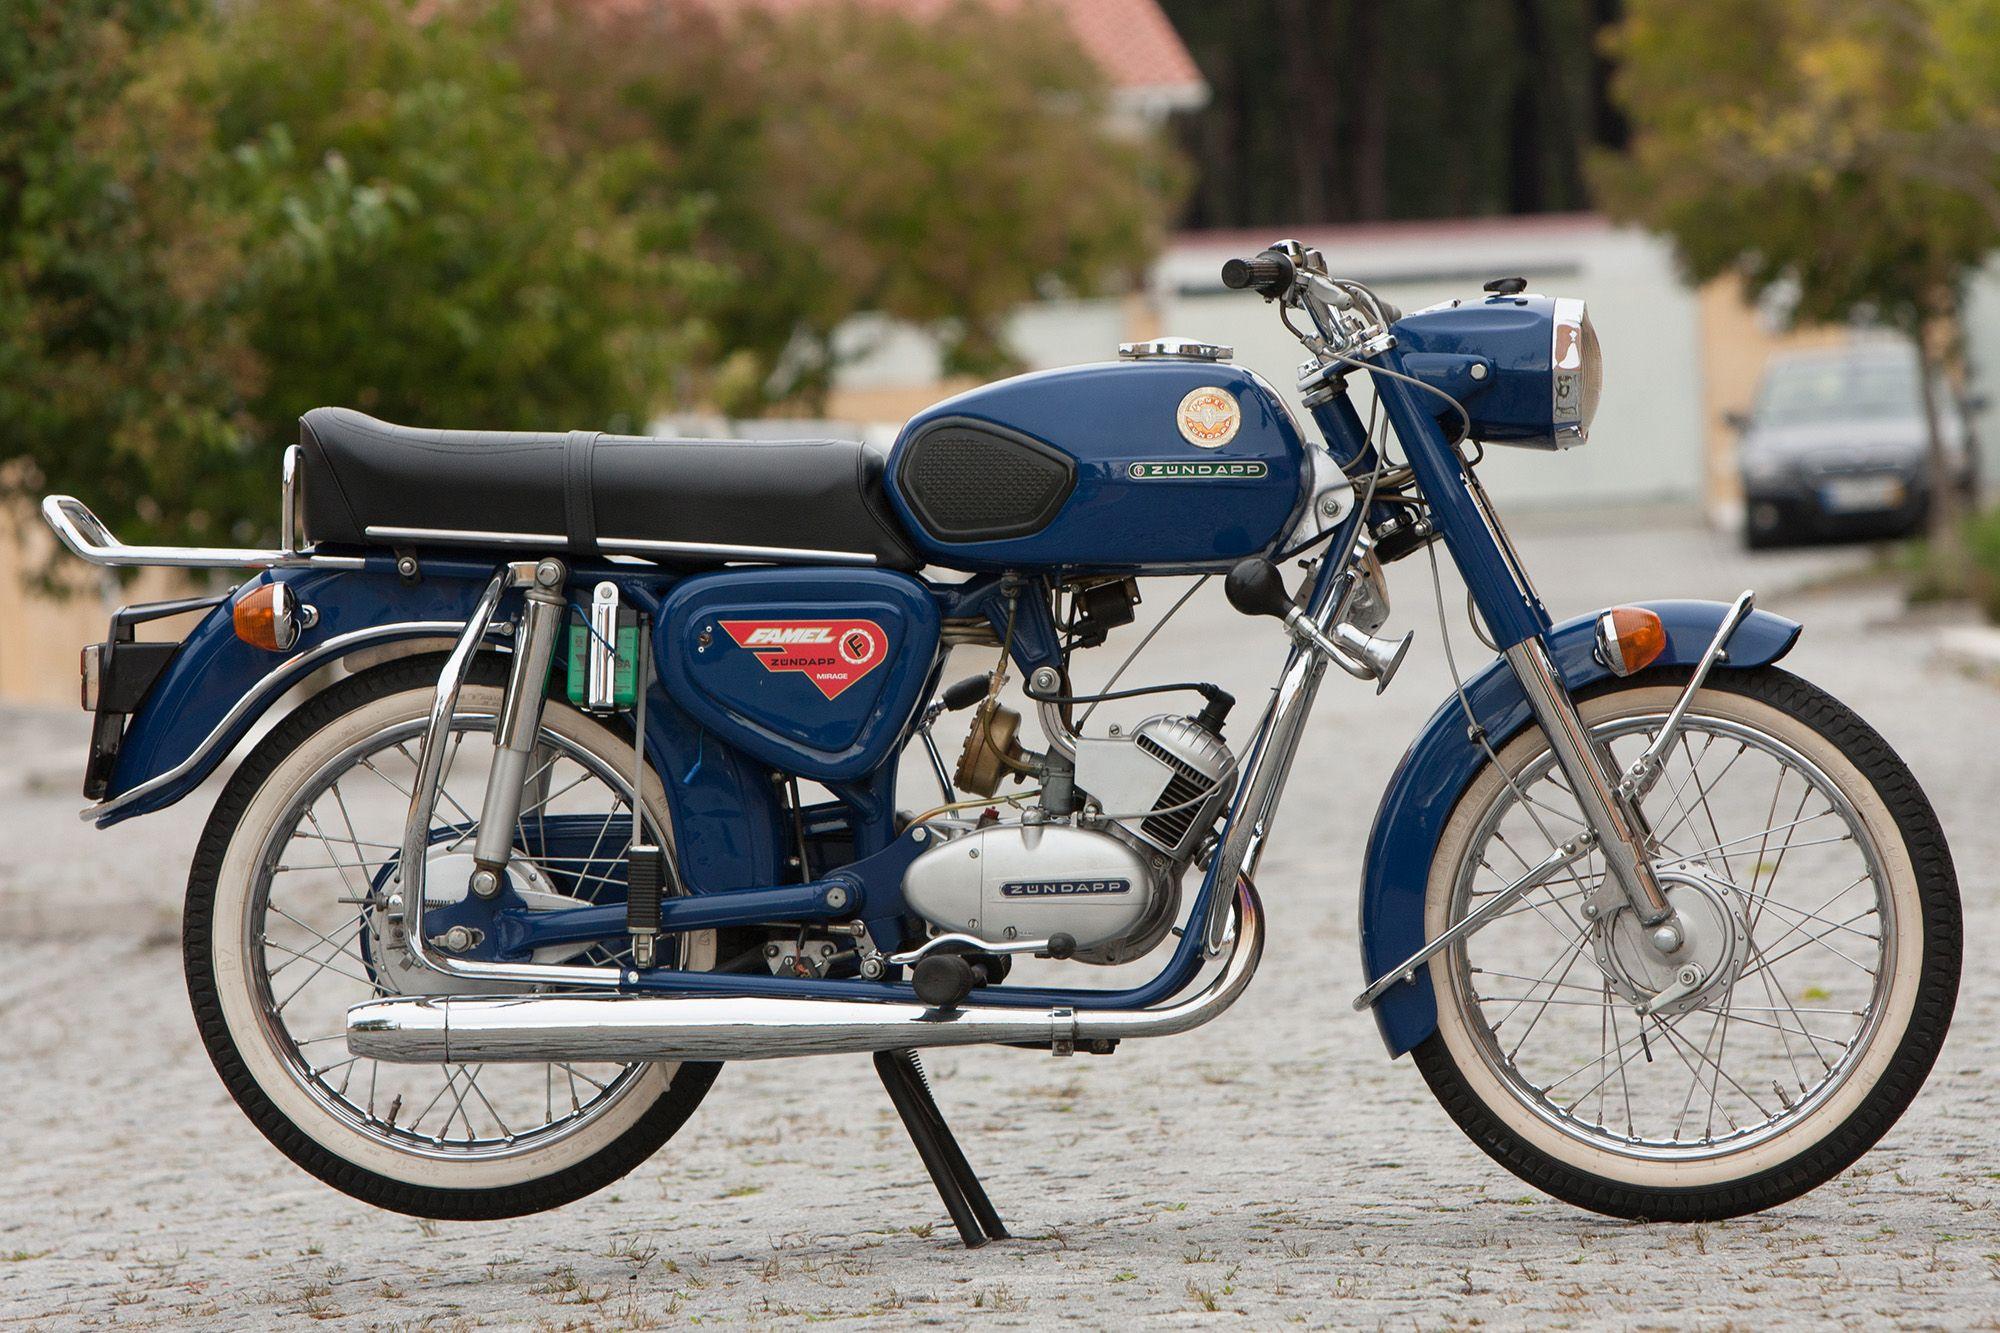 1980 Honda 50cc Dirt Bike